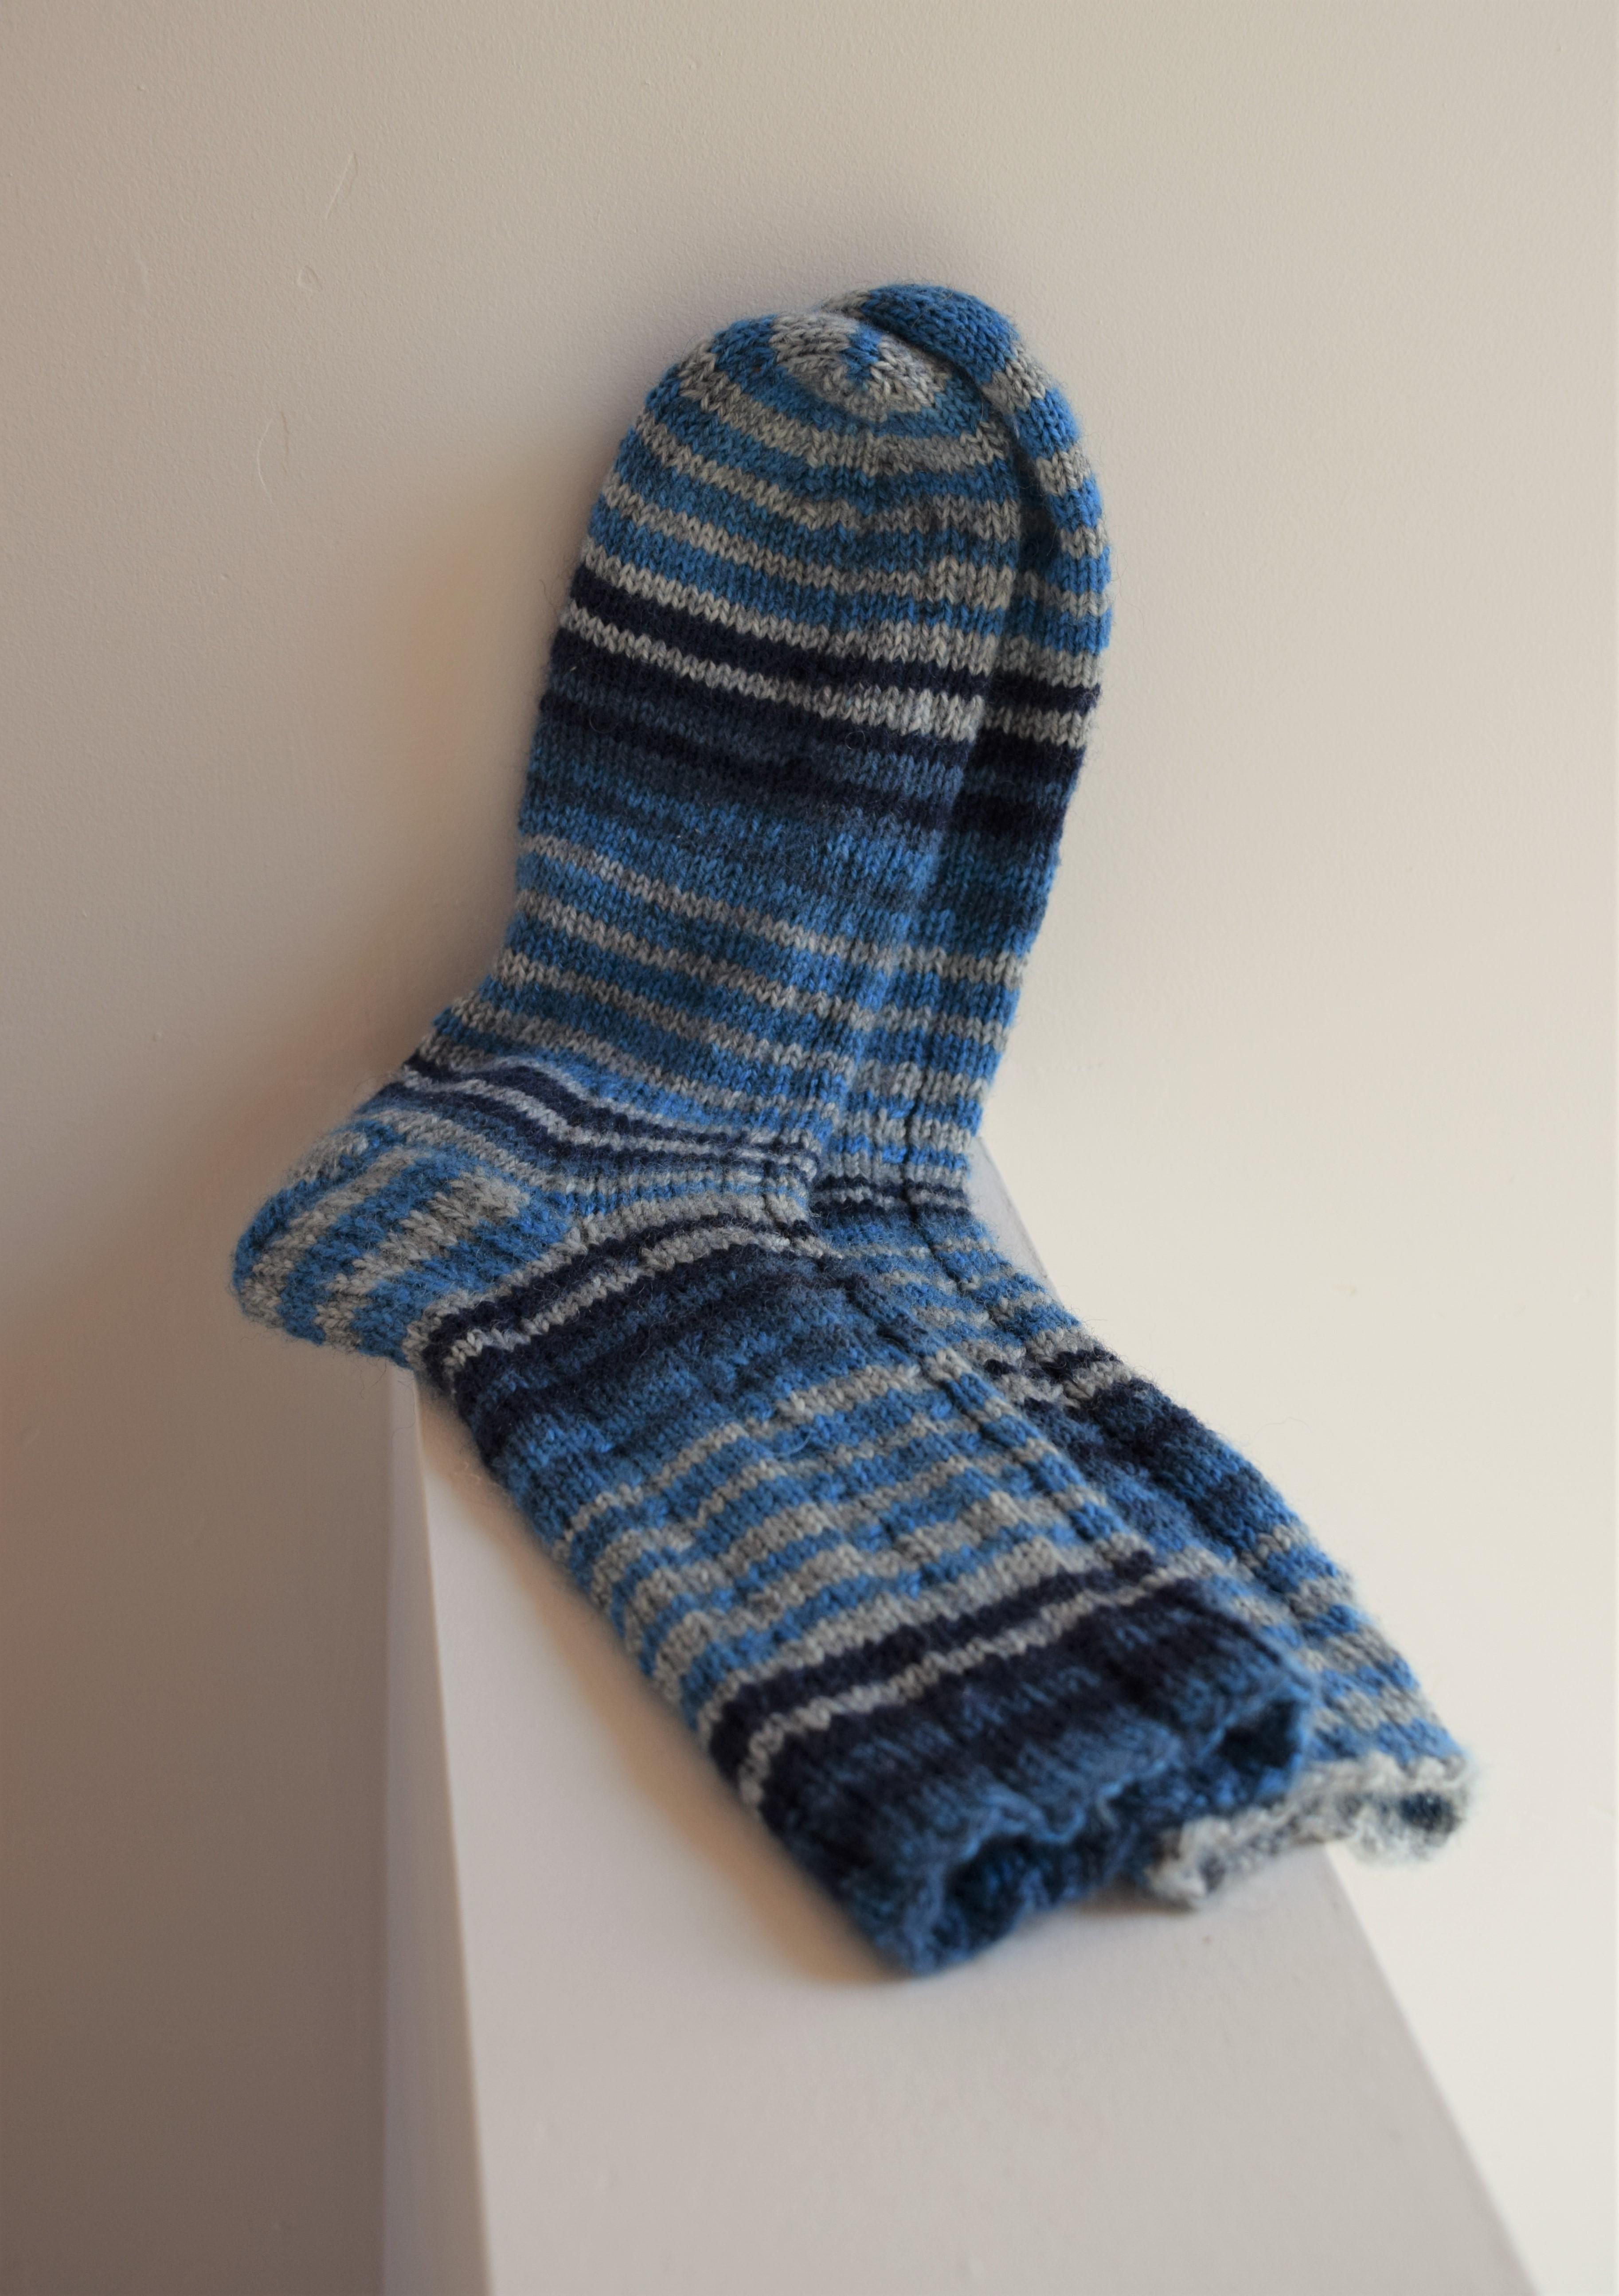 jenjoycedesign© Walking With Emma socks 6